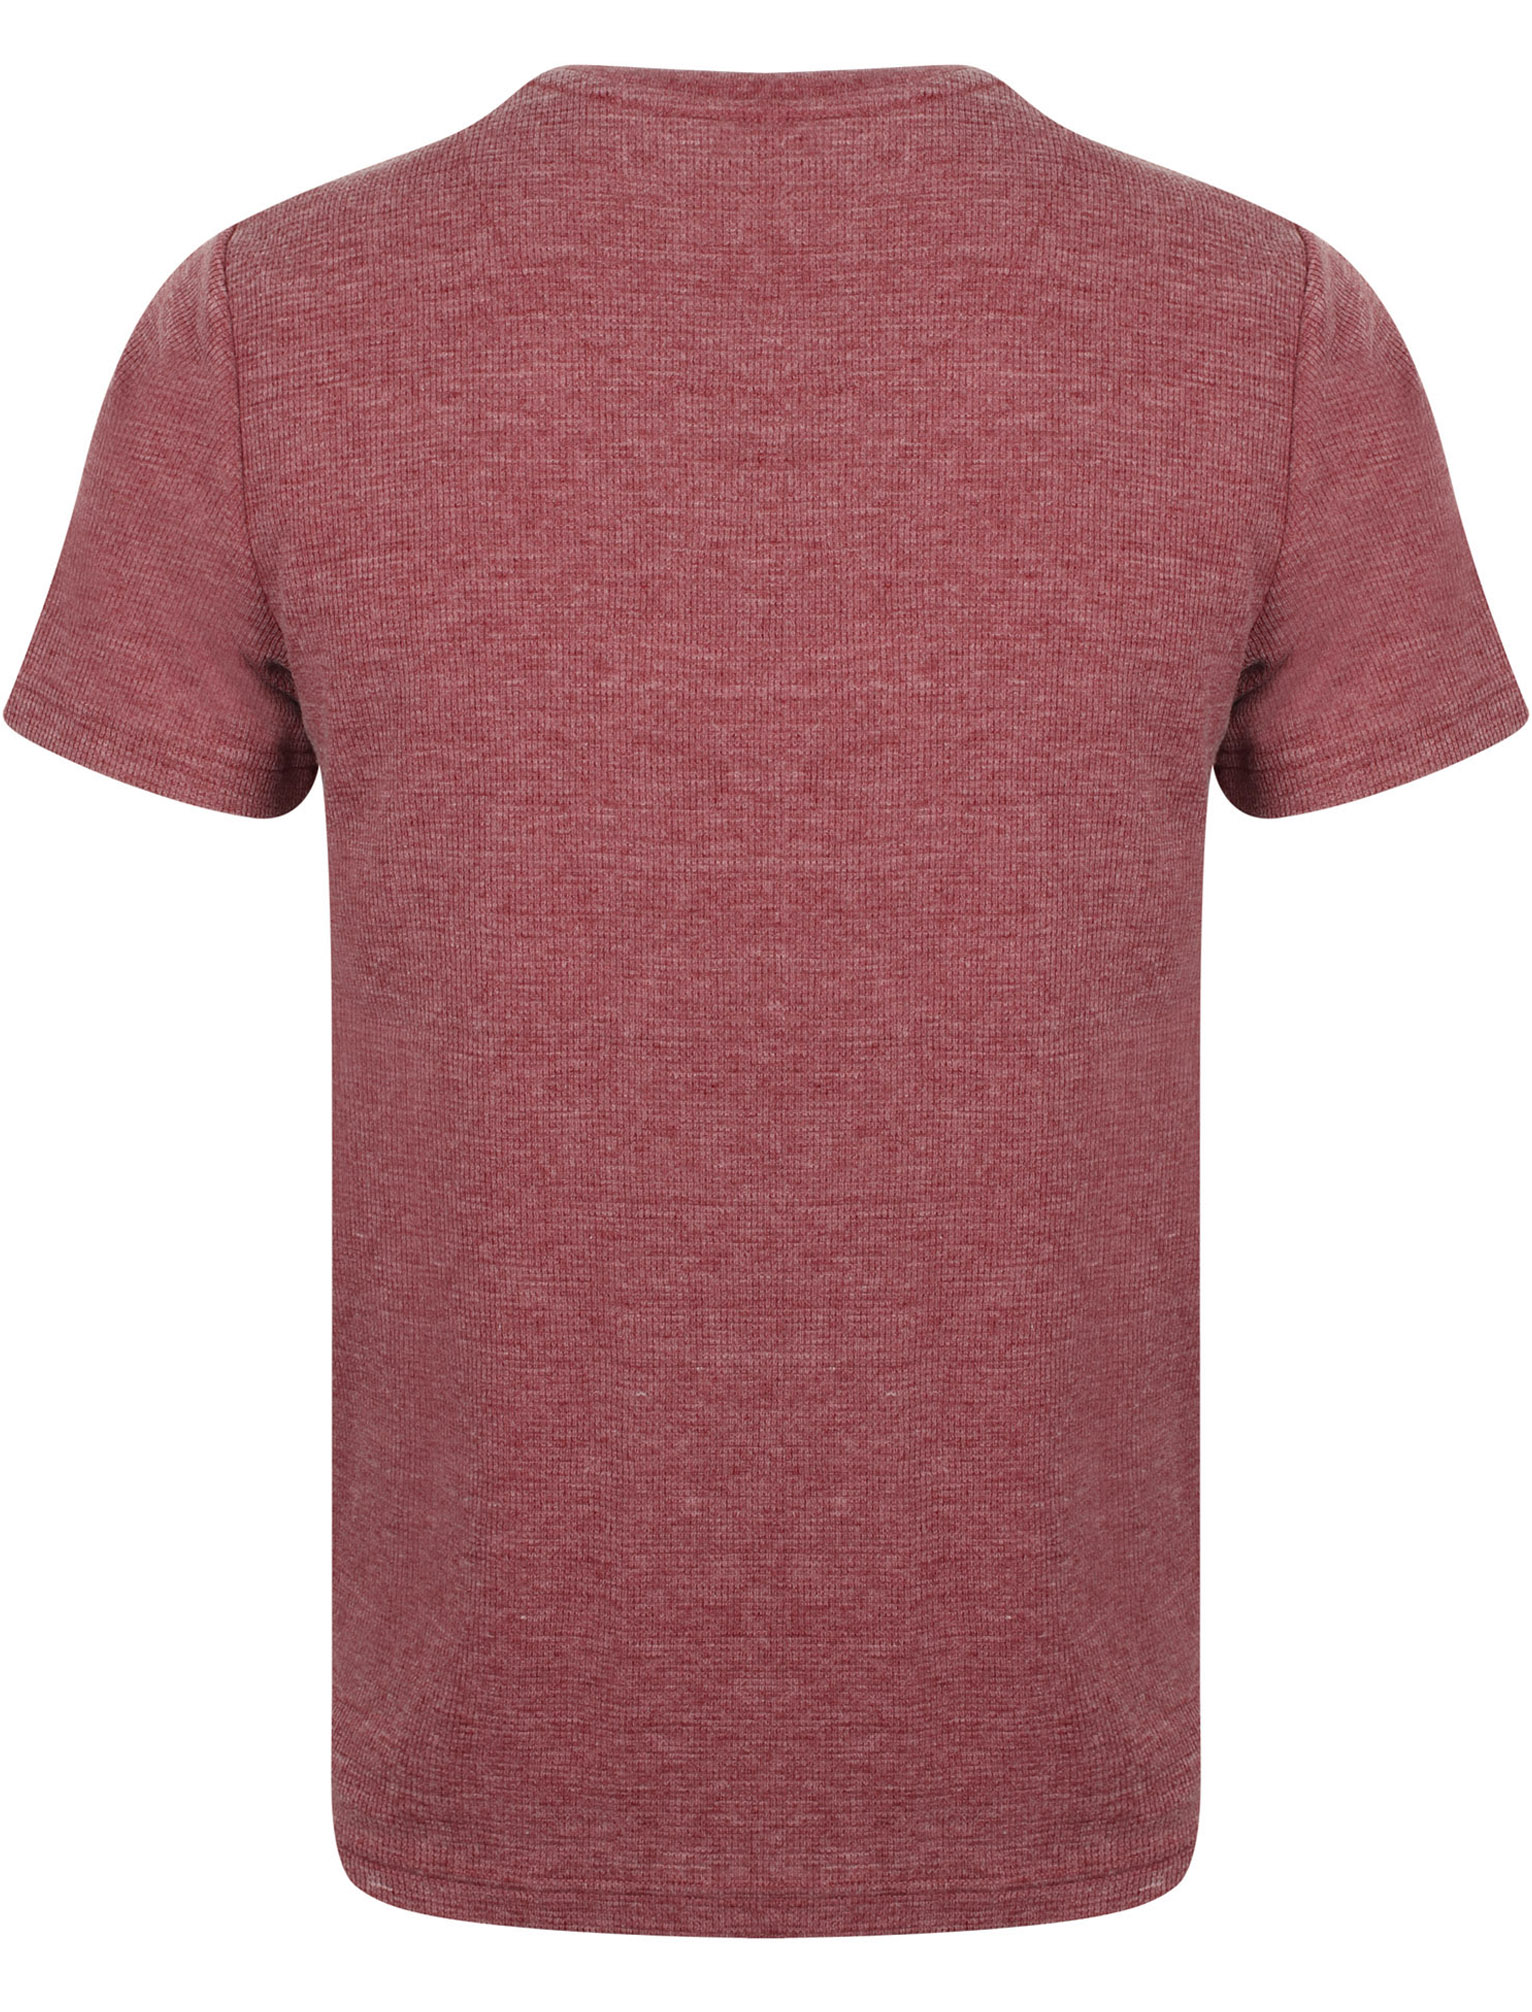 Plain T-Shirs Size S-XXL New Mens Tokyo Laundry Crew Neck Cotton Blend Printed